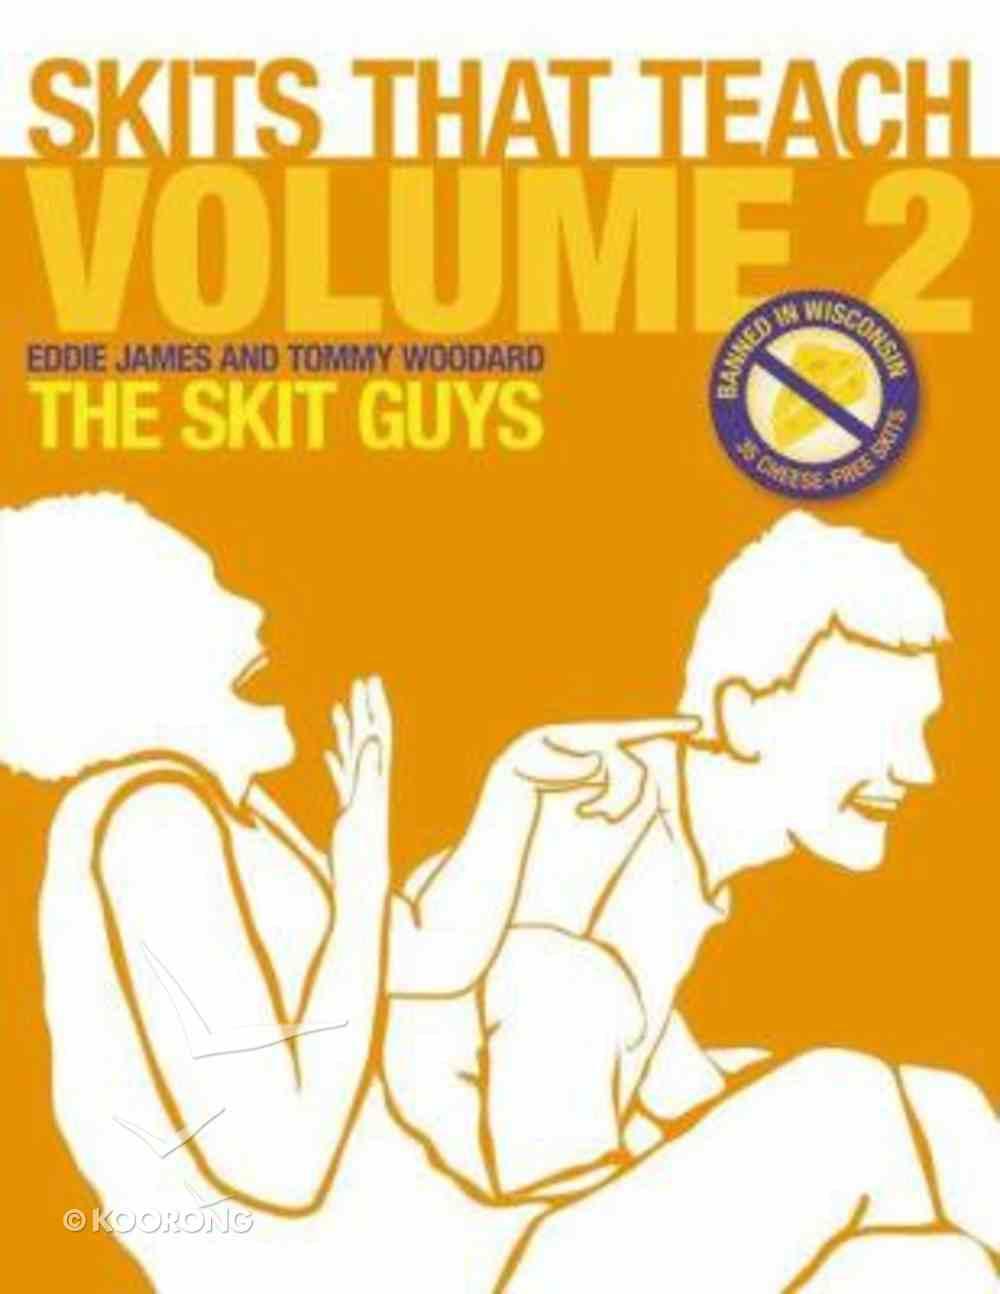 Skits That Teach (Vol 2) Paperback